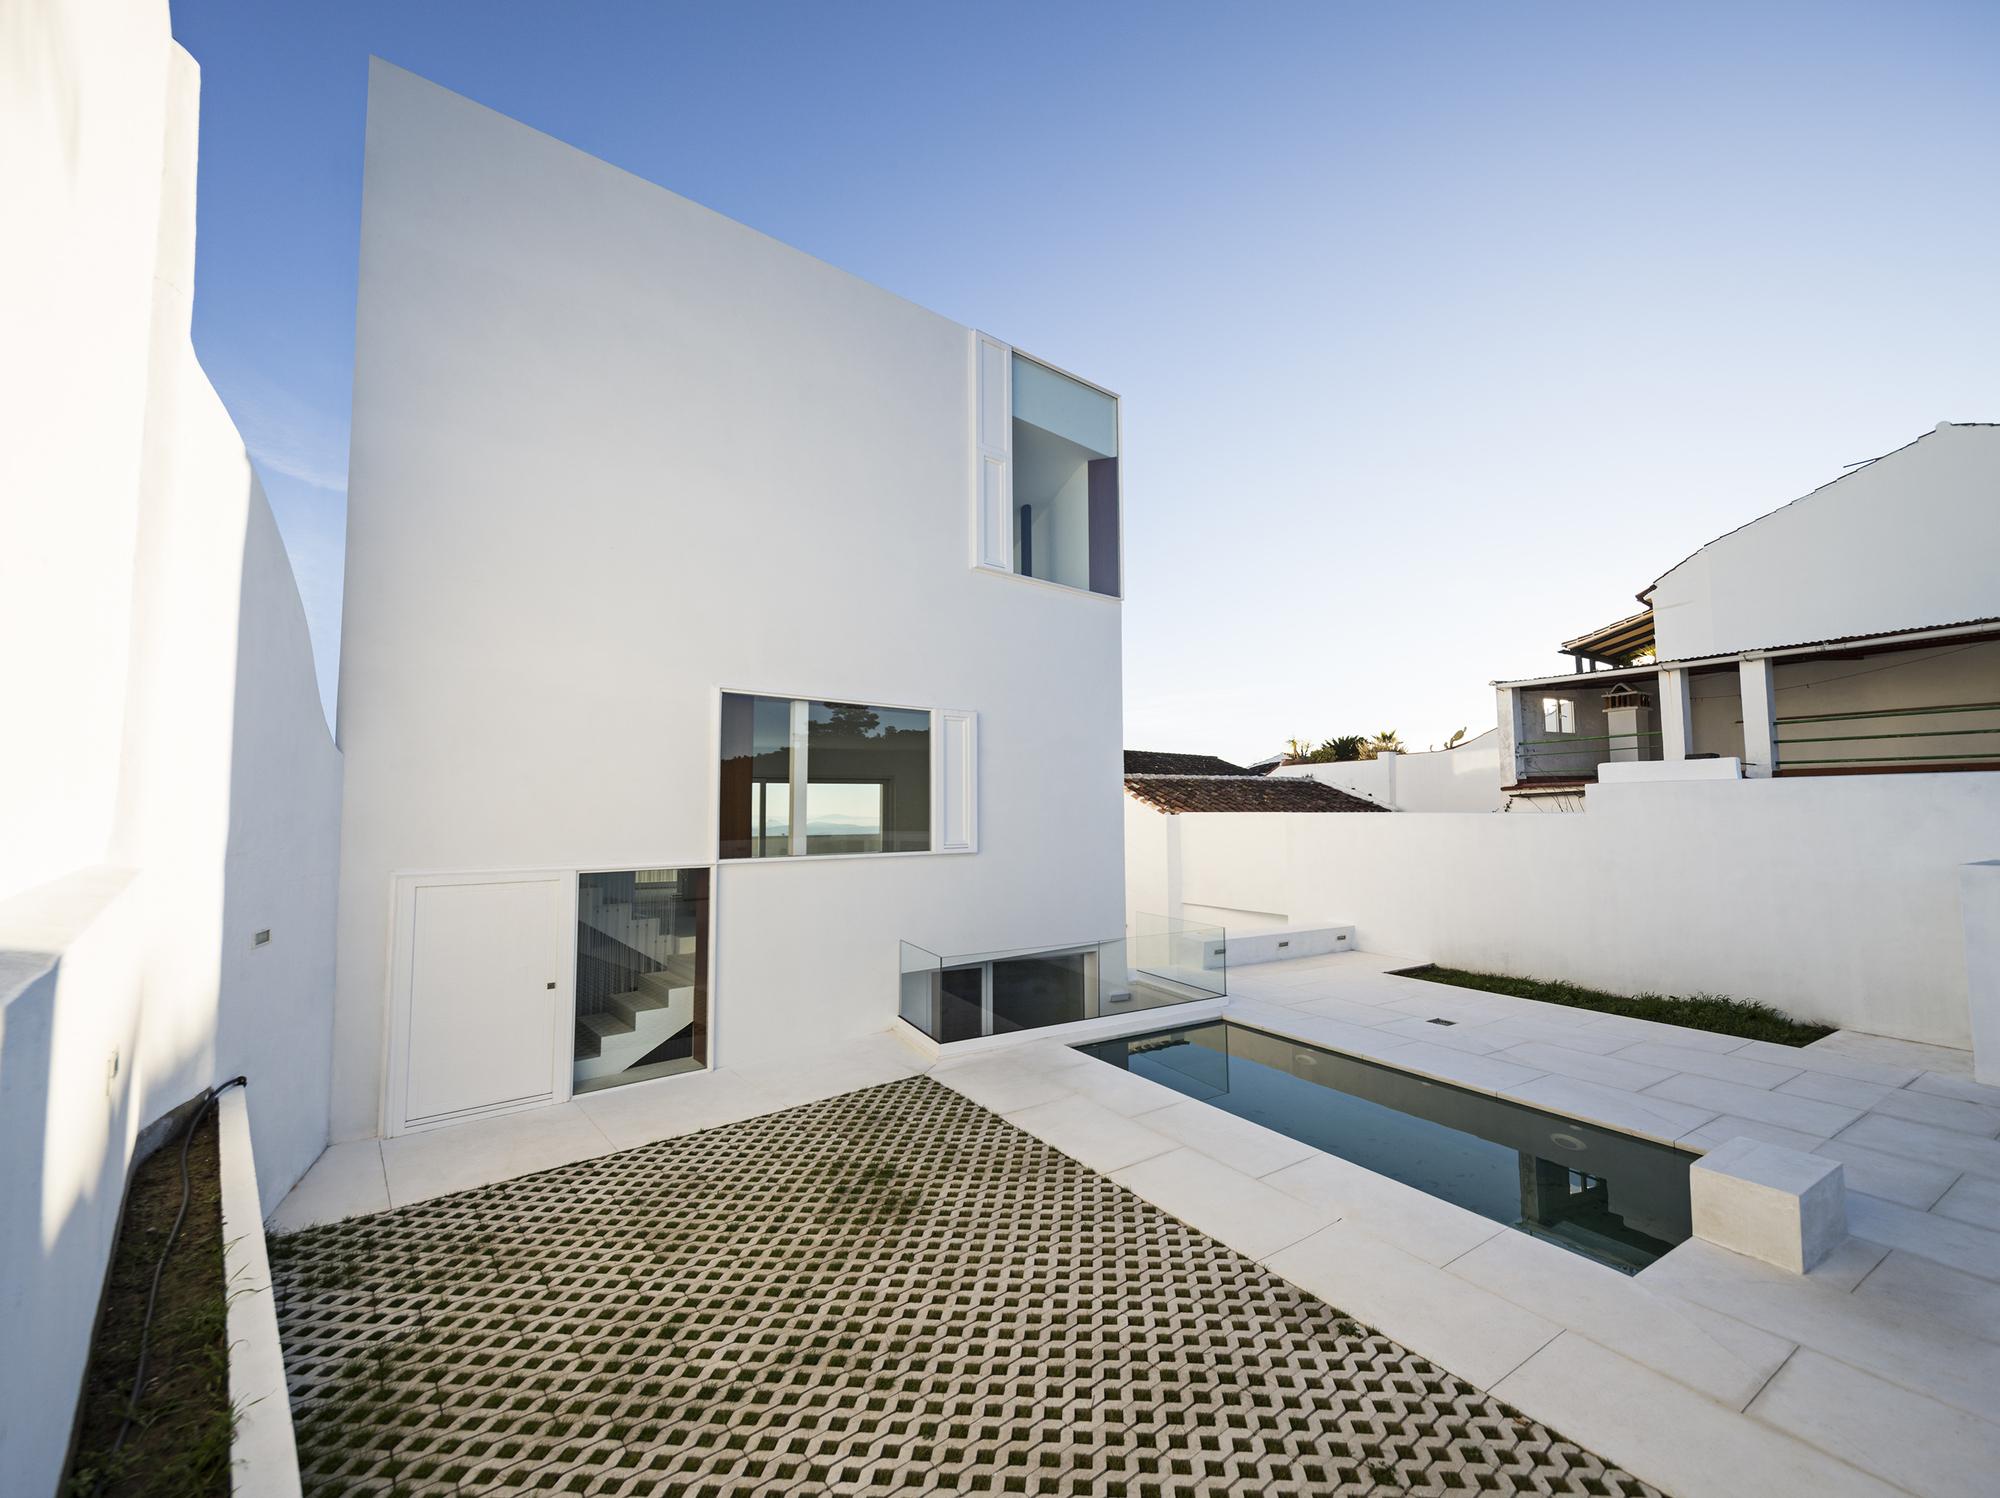 galeria de casa claire dtr studio architects 10. Black Bedroom Furniture Sets. Home Design Ideas